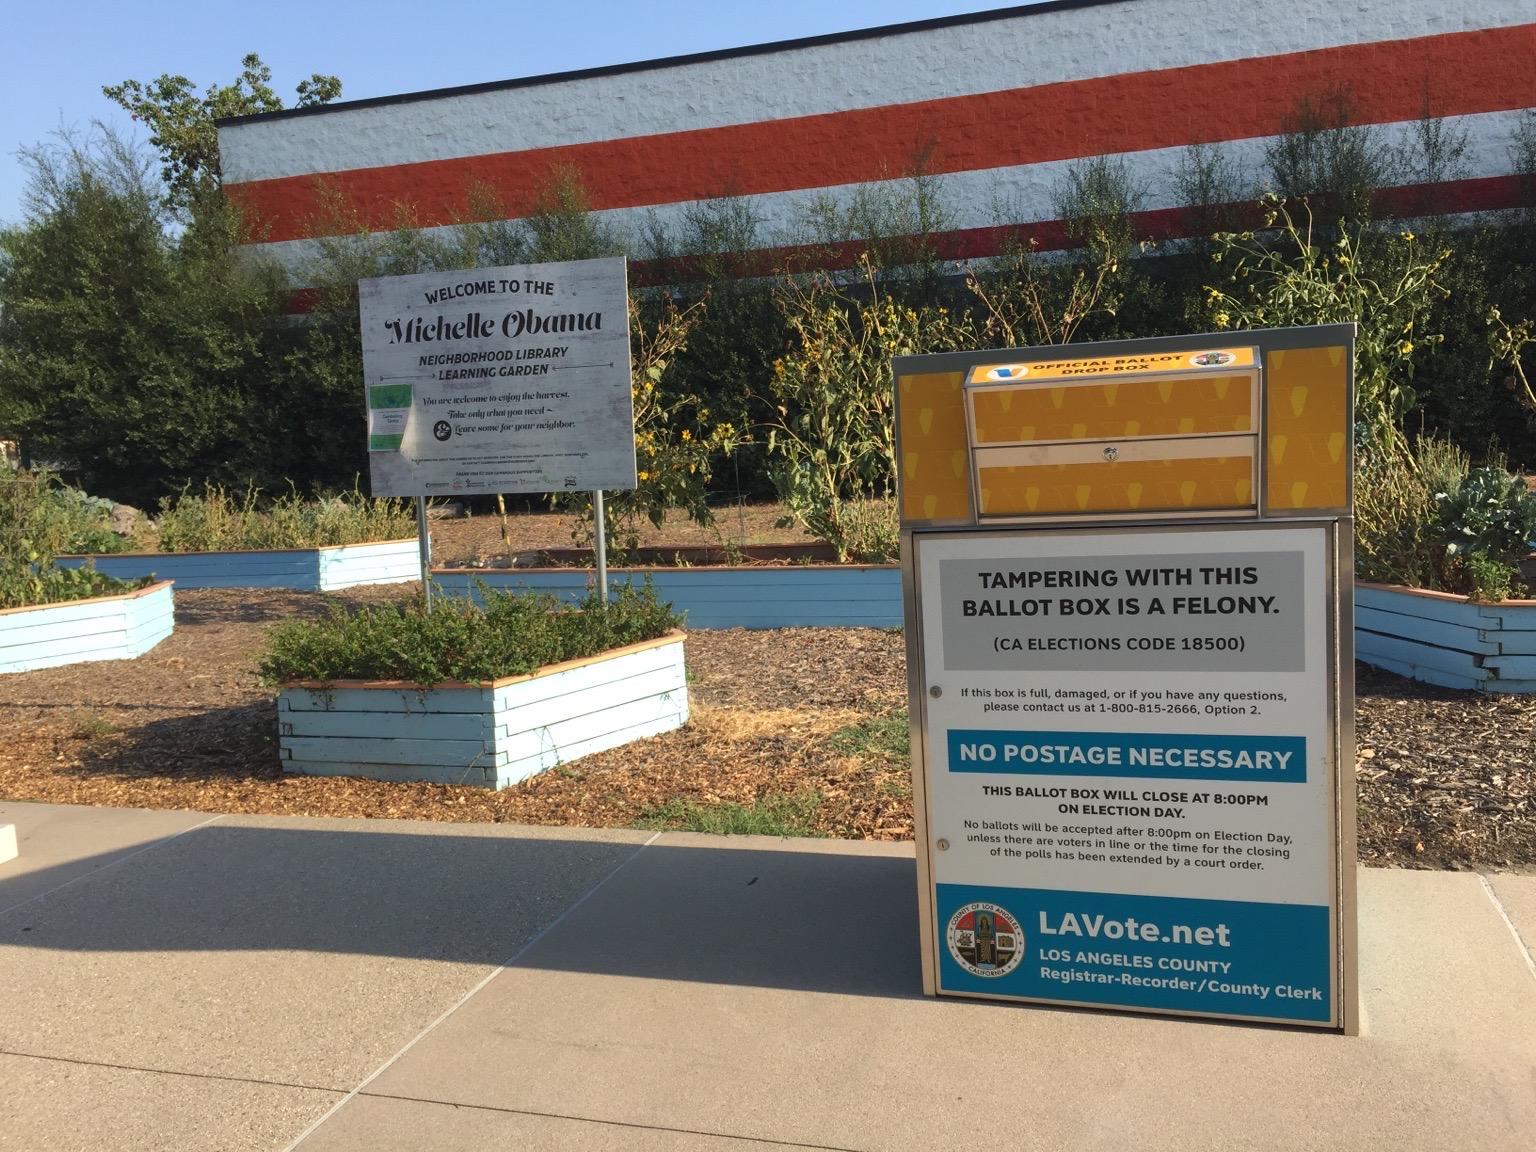 County Installs 16 Ballot Drop Boxes Throughout Long Beach For November Election Long Beach Post News